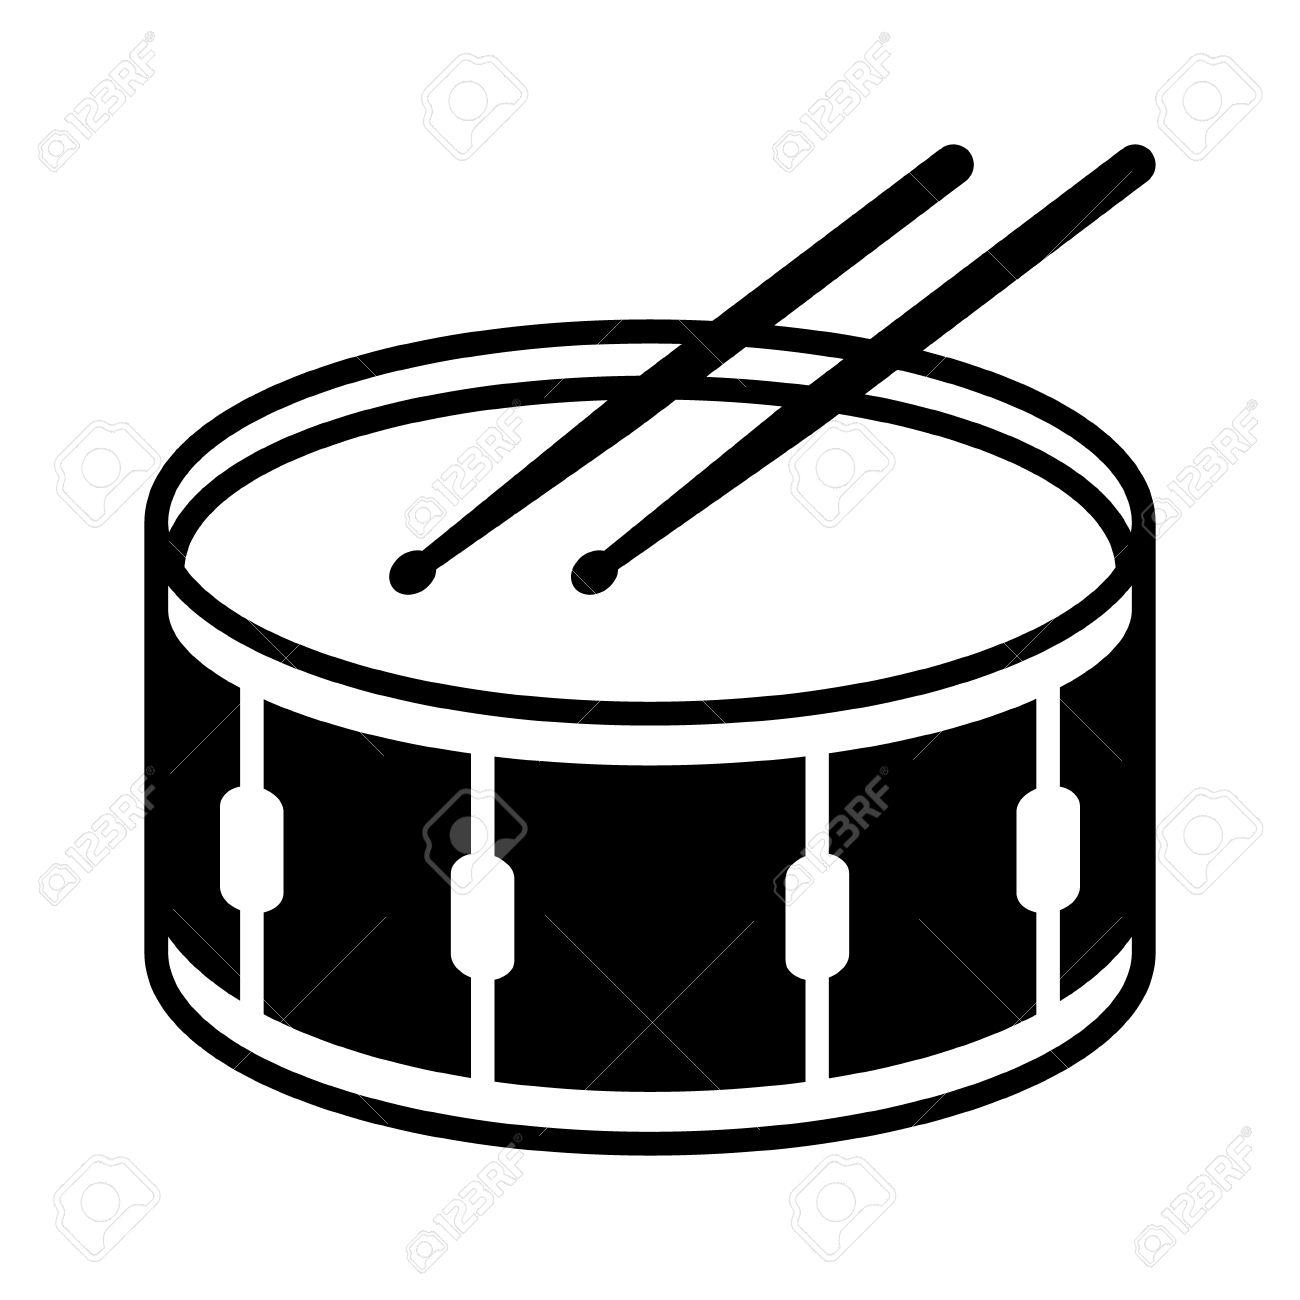 Orchestra Music Sound Percussion Symbol Instrumental Digital Musical Education Instrument Snare Drum Snaredrum Mar